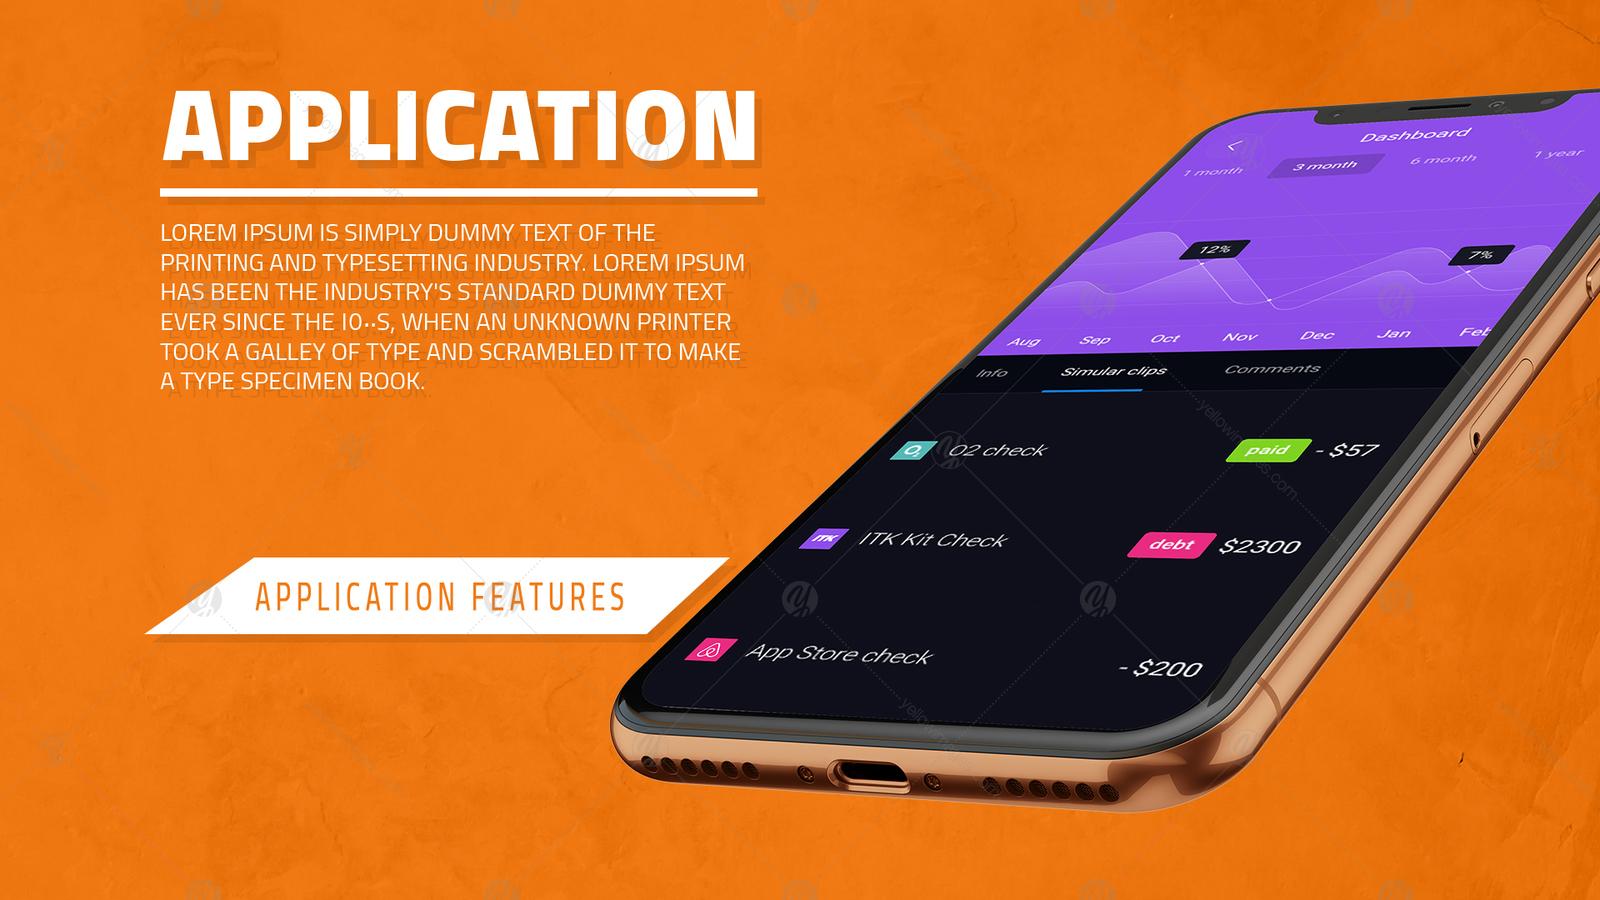 iPhone X App Promotion